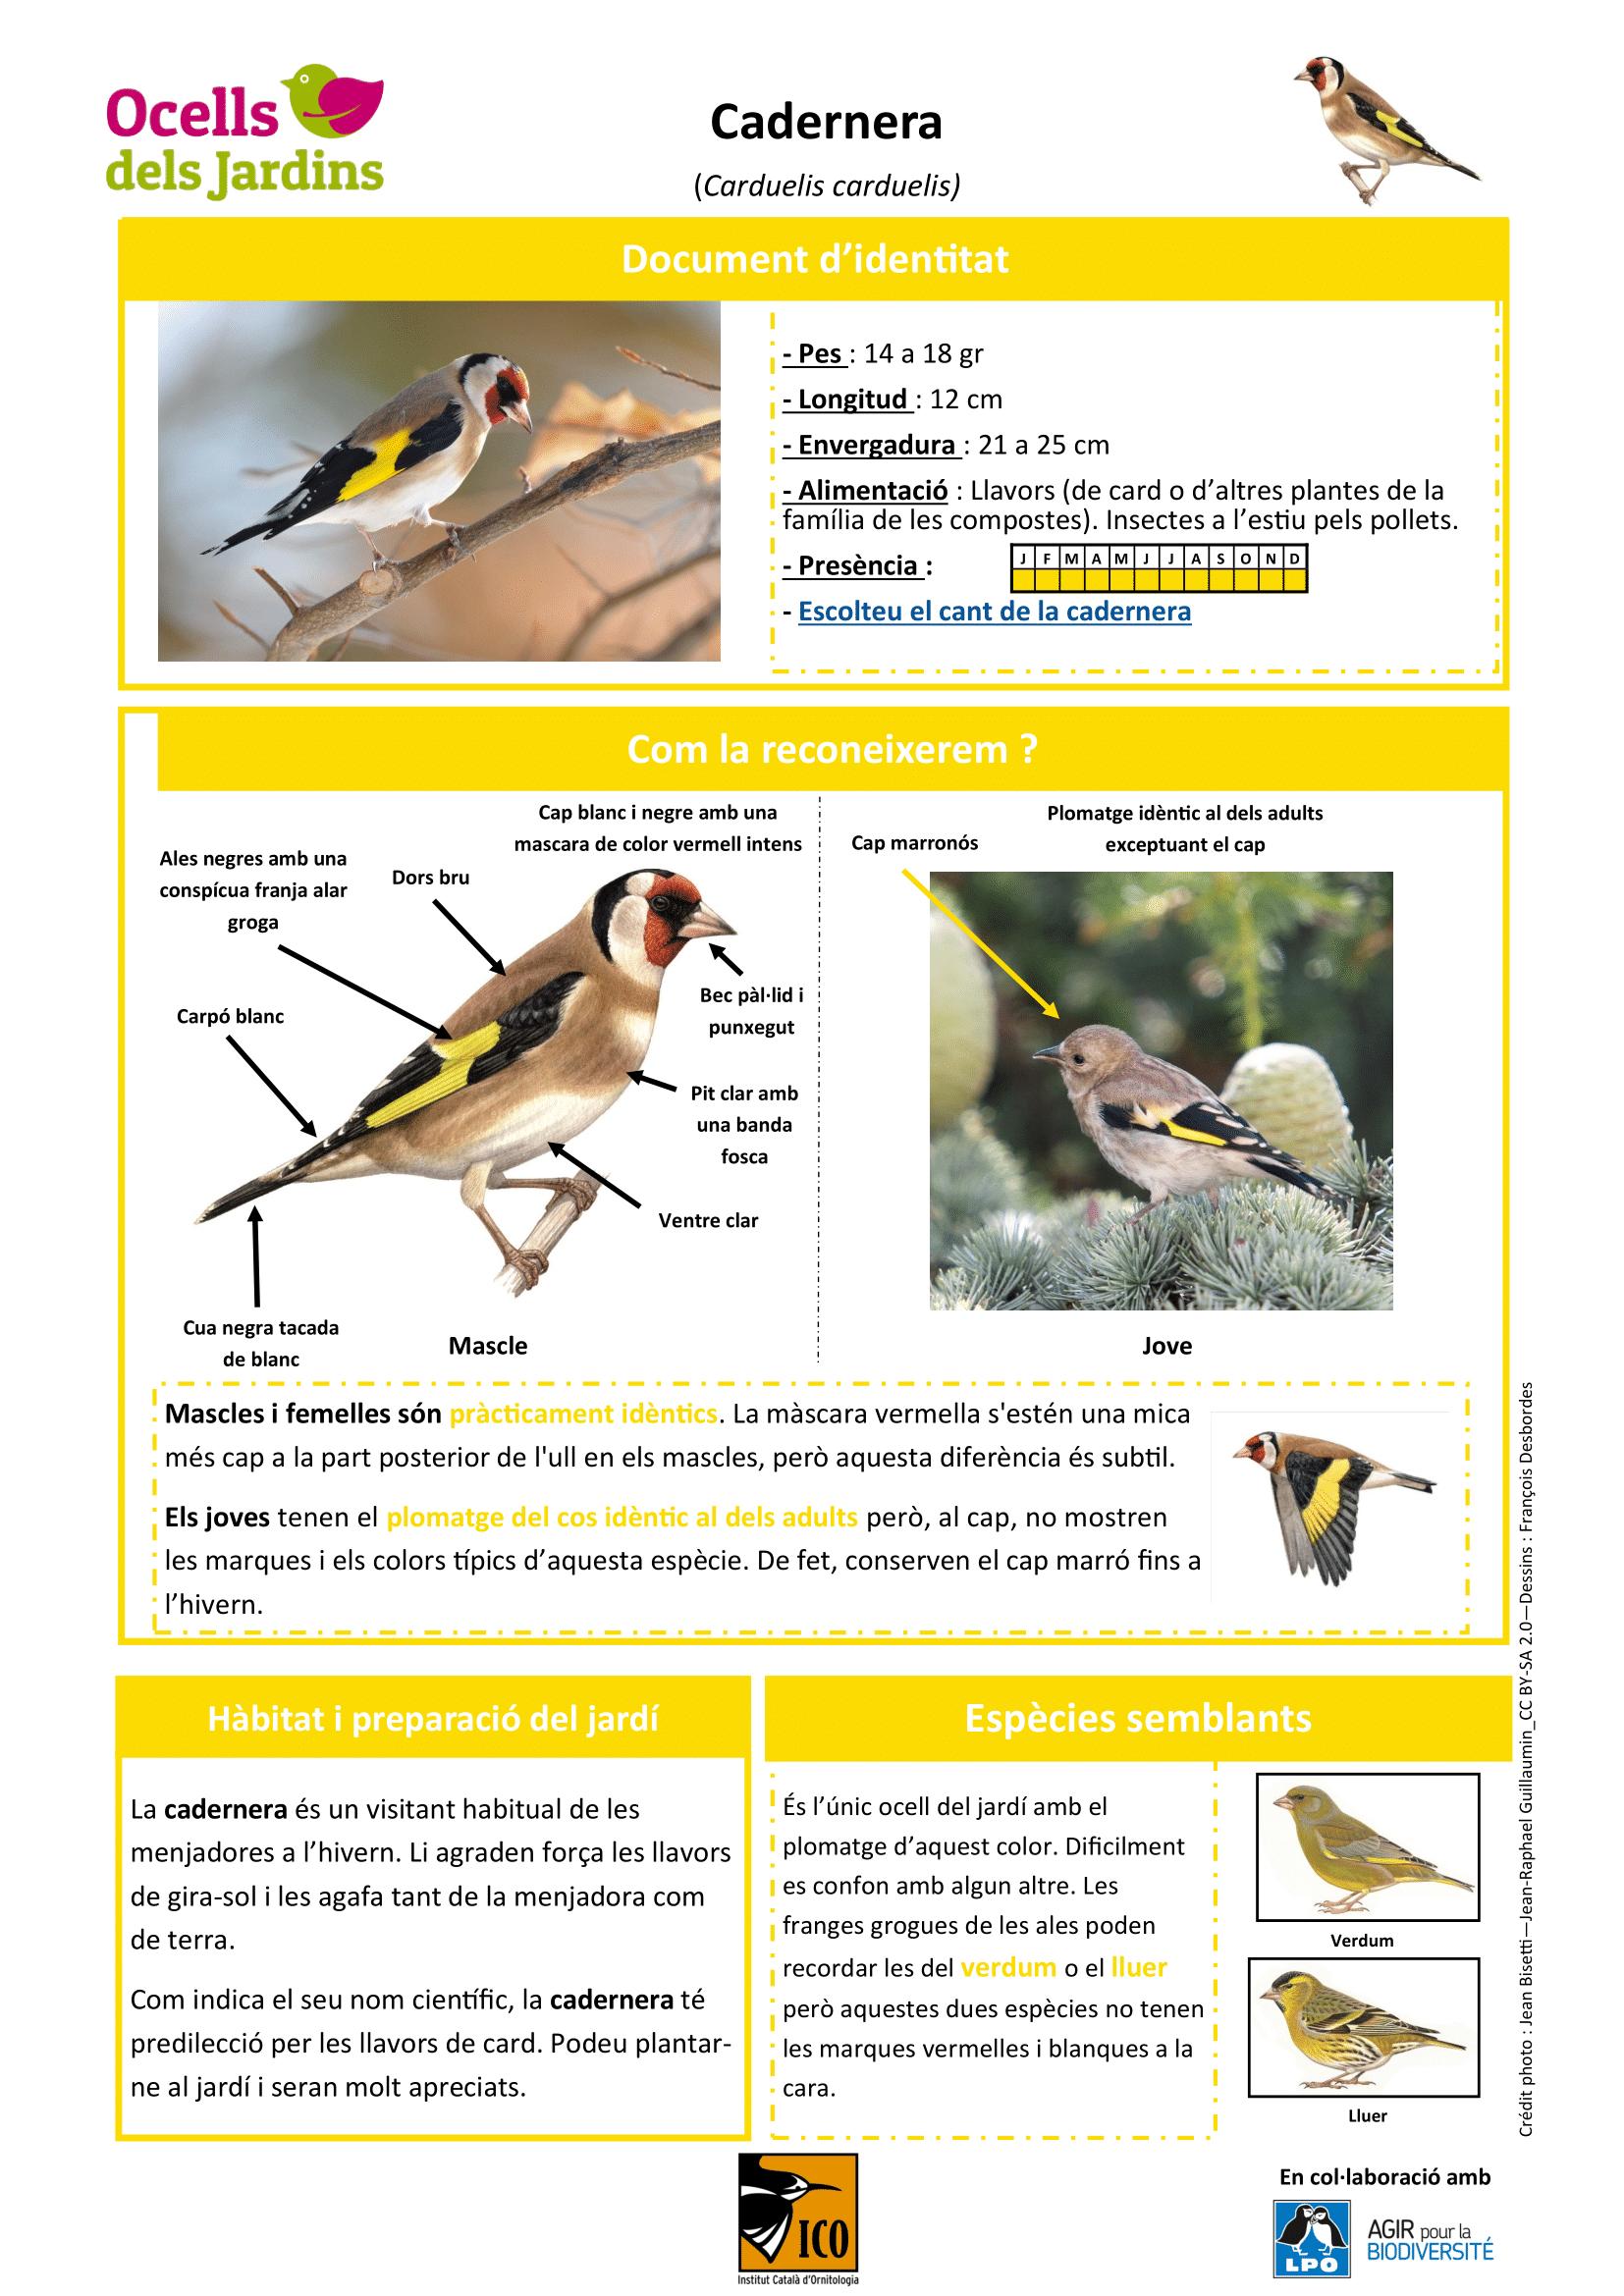 https://cdnfiles1.biolovision.net/www.ocellsdelsjardins.cat/userfiles/cadernera-1.png